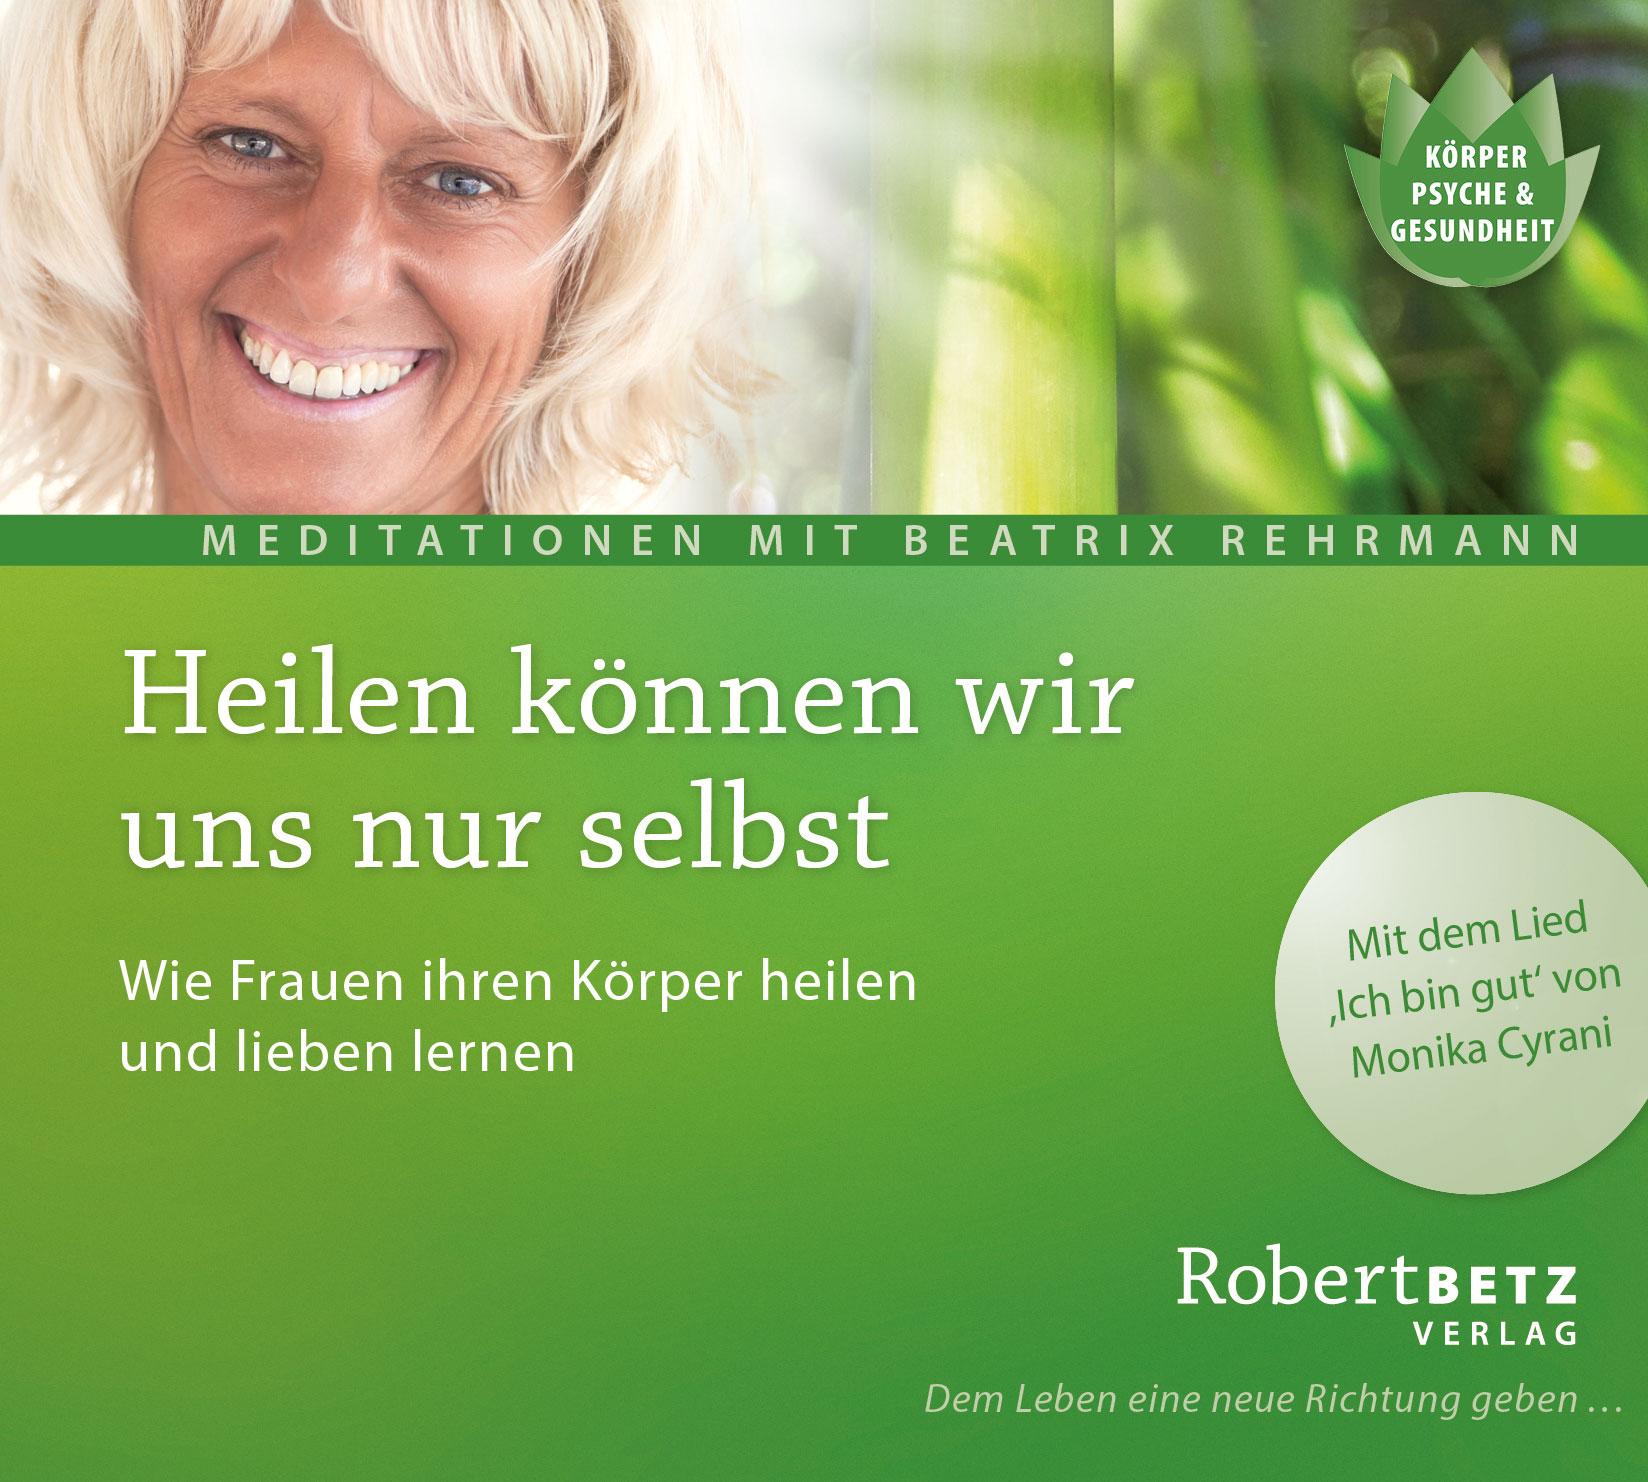 Heilen können wir uns nur selbst - Robert Betz